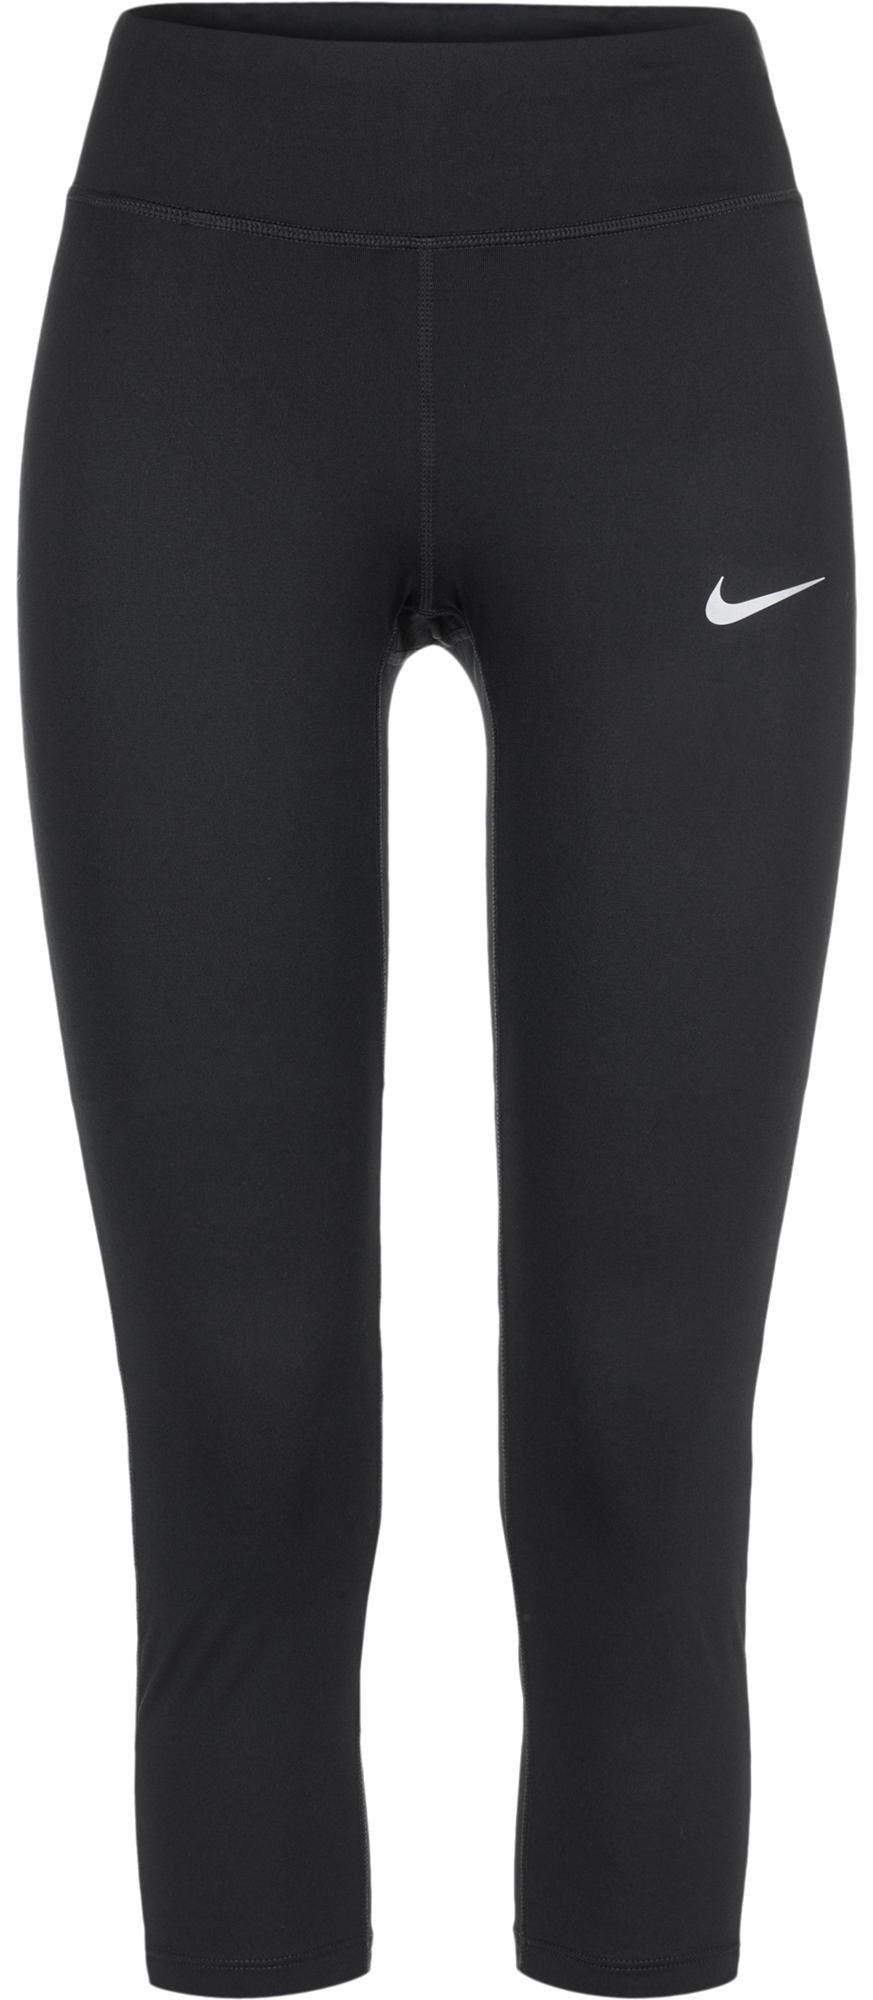 Nike Бриджи женские Nike Power Essential бриджи nike бриджи dri fit touch fleece 3 4 pants